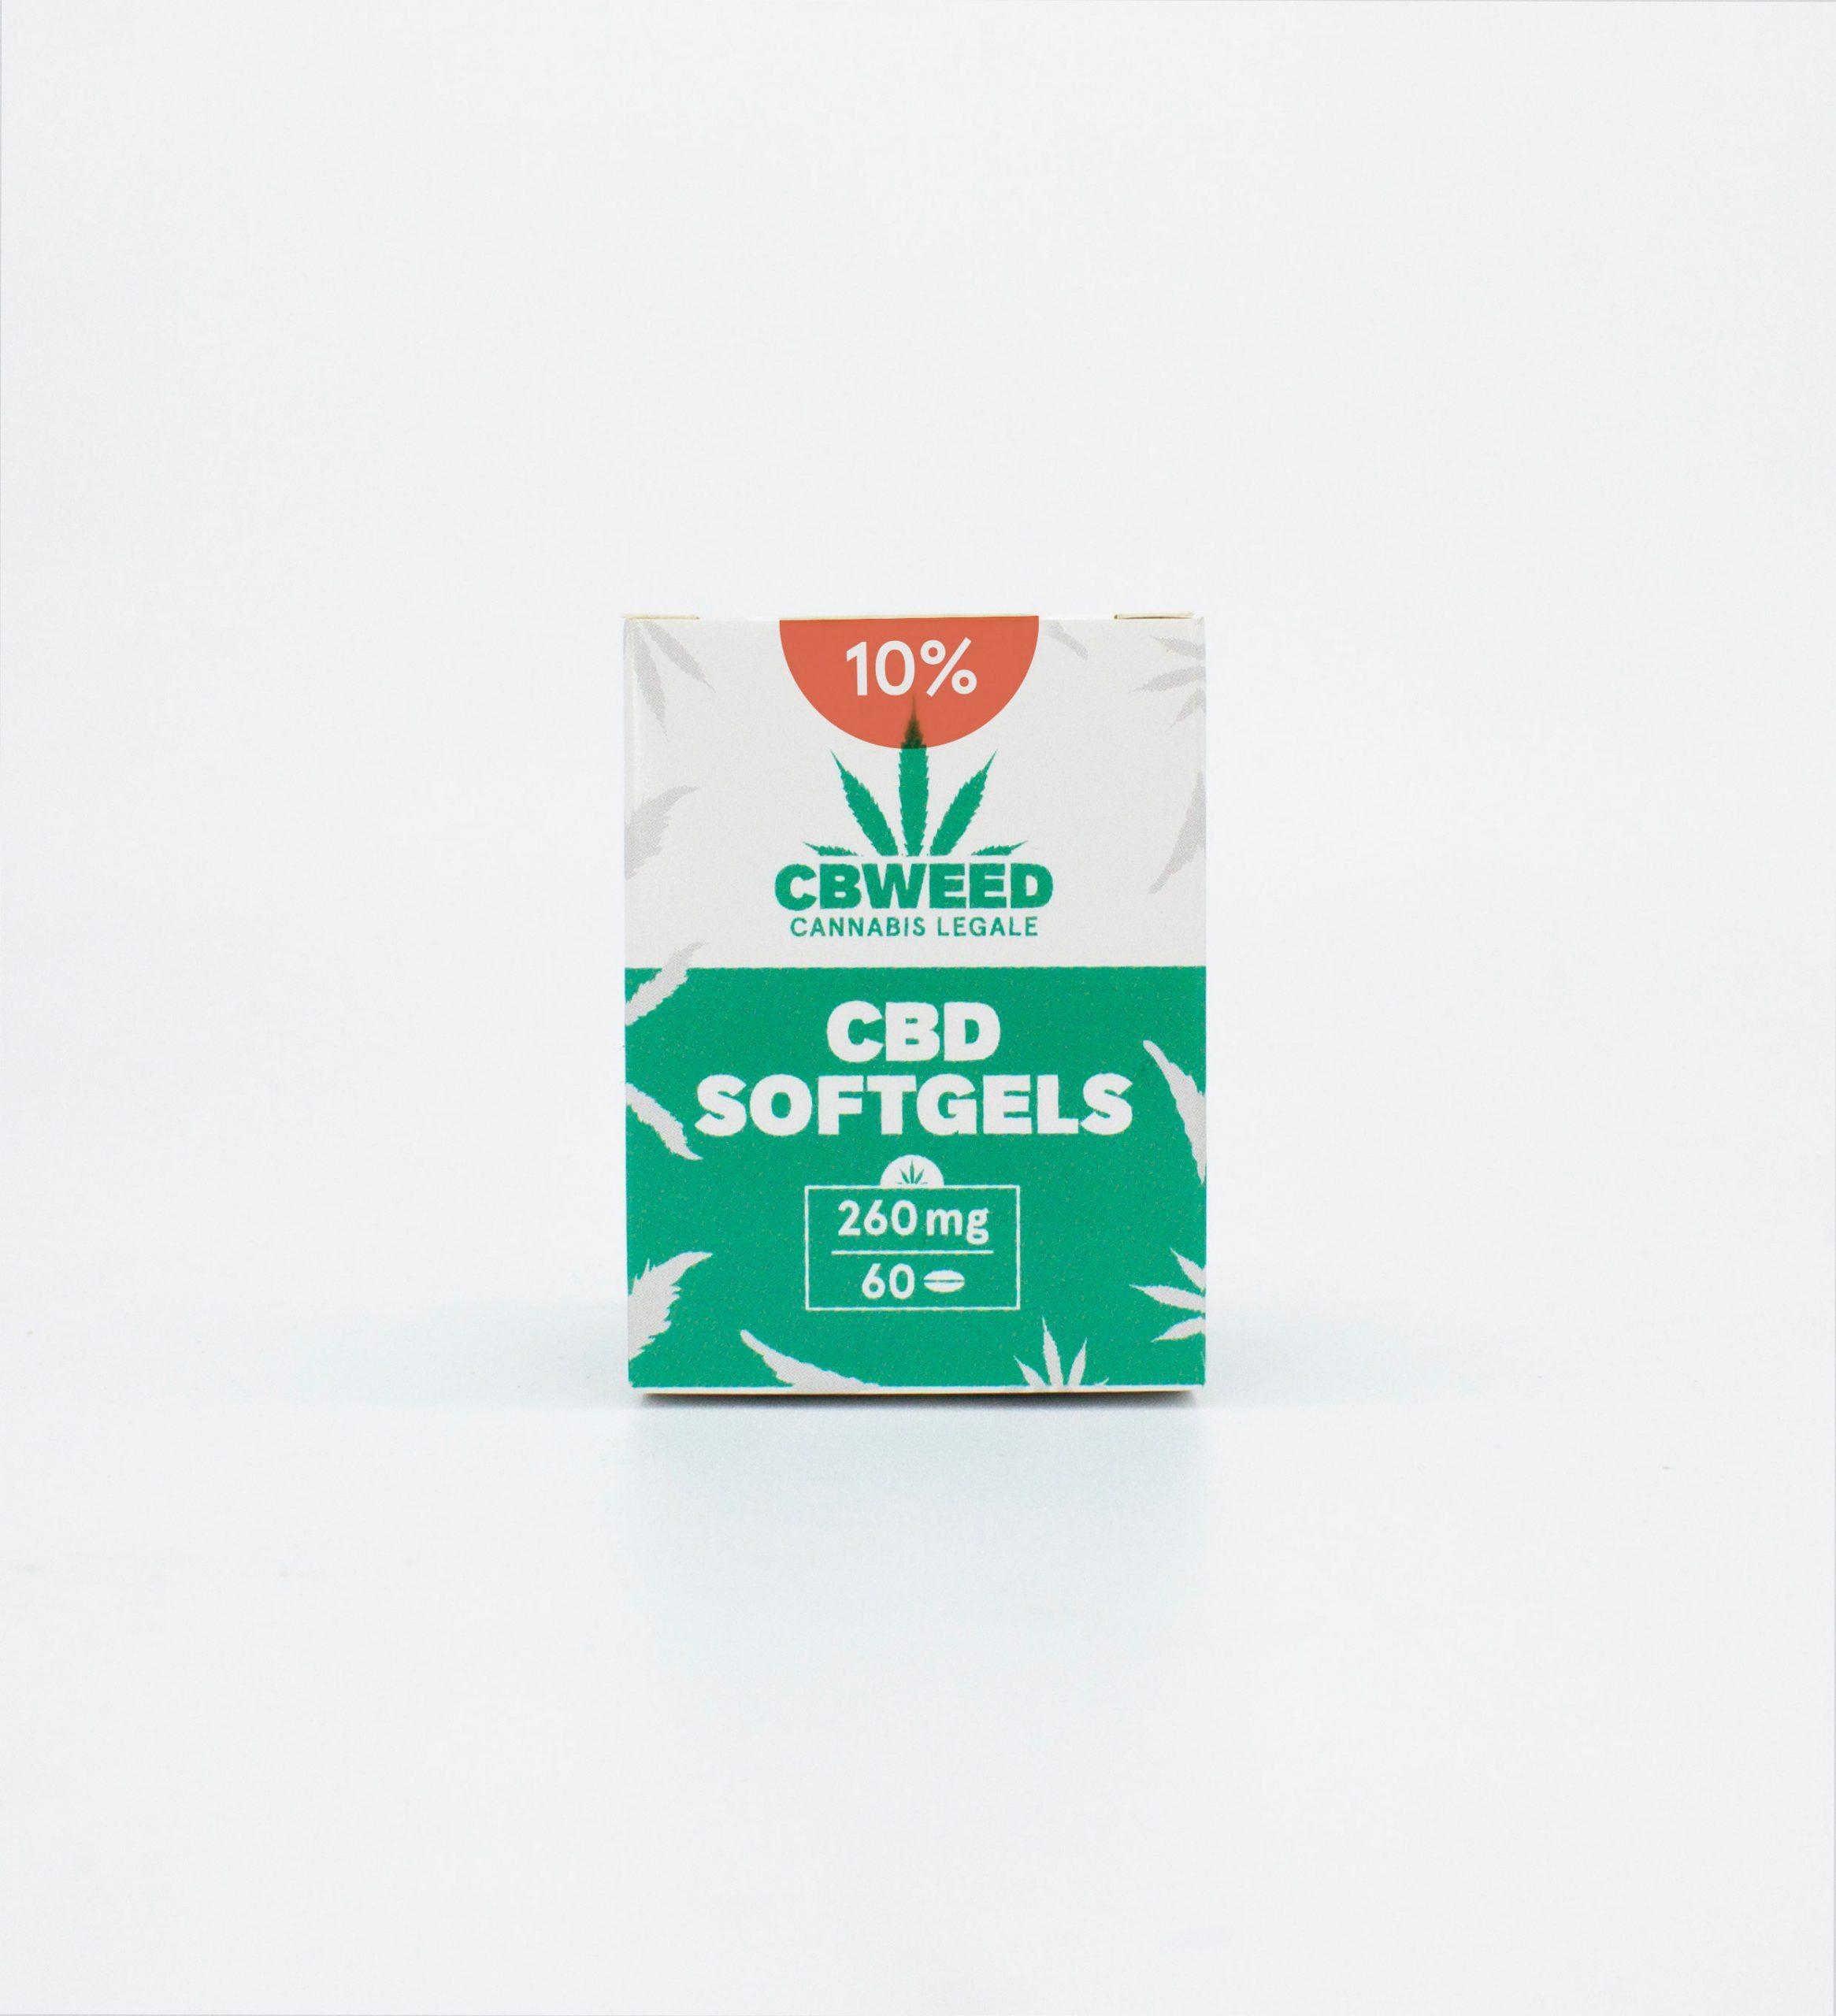 CBD capsule 03 scaled - Capsule Softgel CBD - 10% CBD